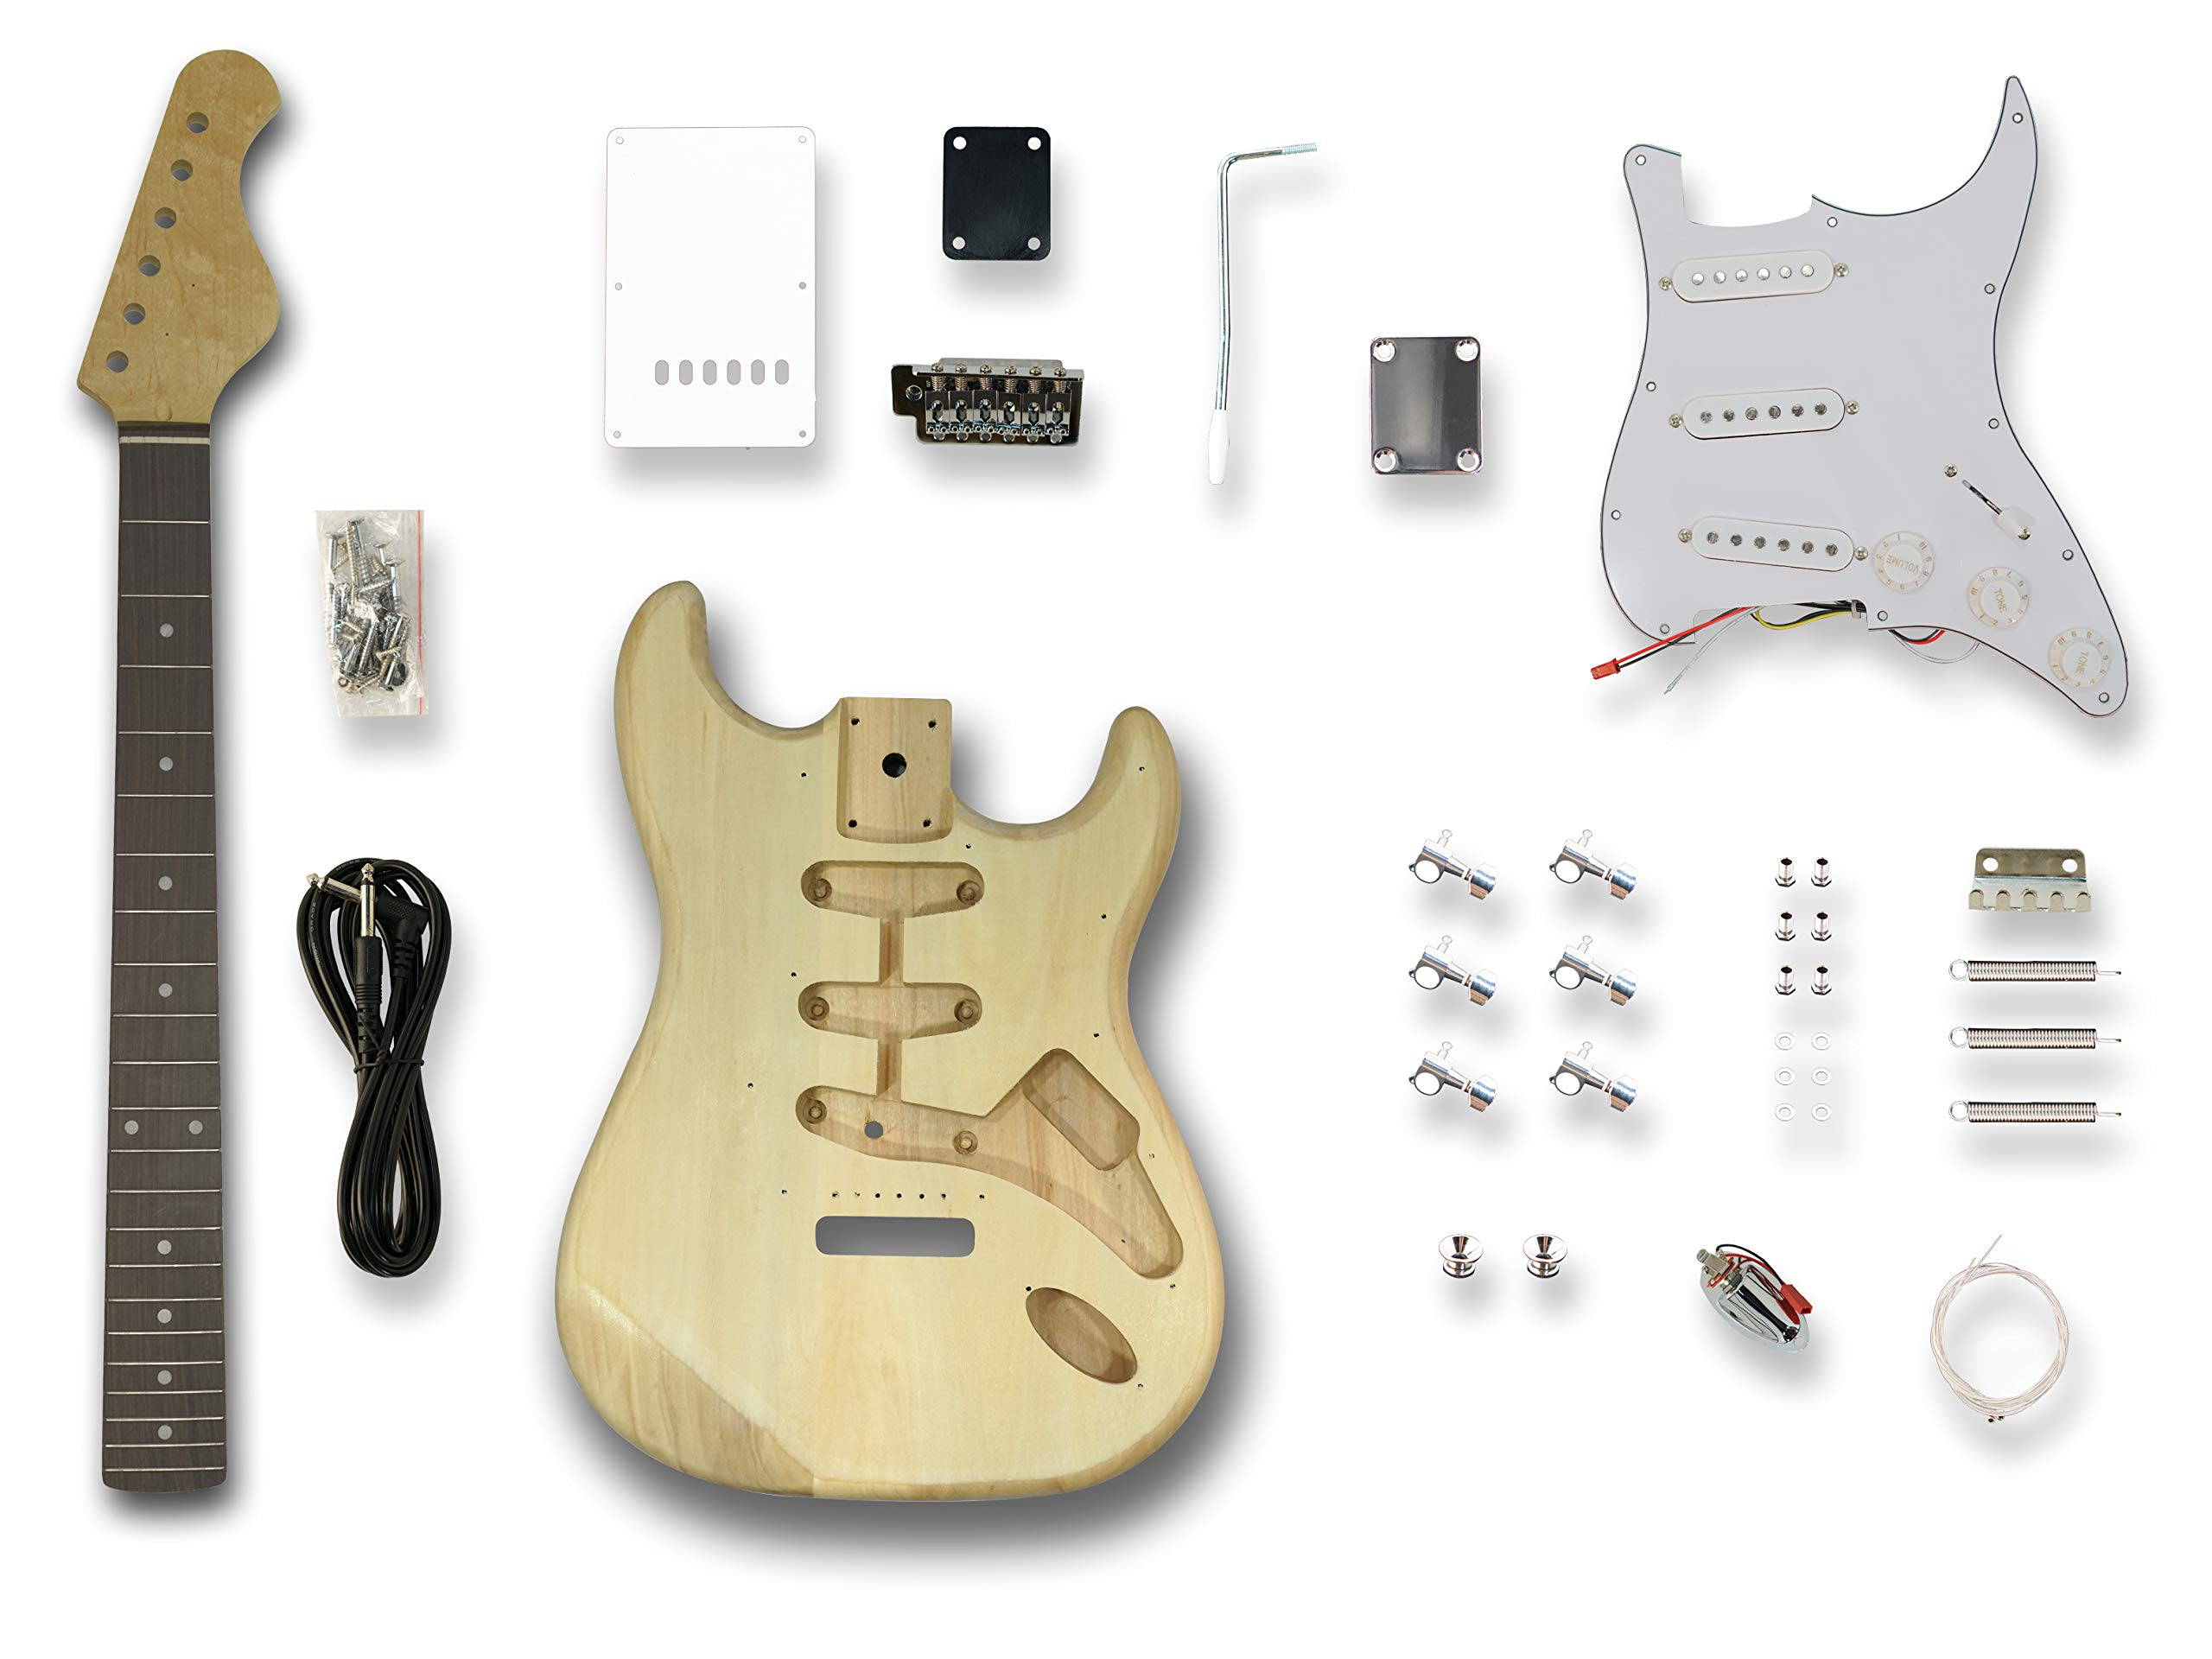 DIY Electric Guitar Kits for Stratcaster Electric Guitar,Poplar wood Body, Linden Veener Top & back